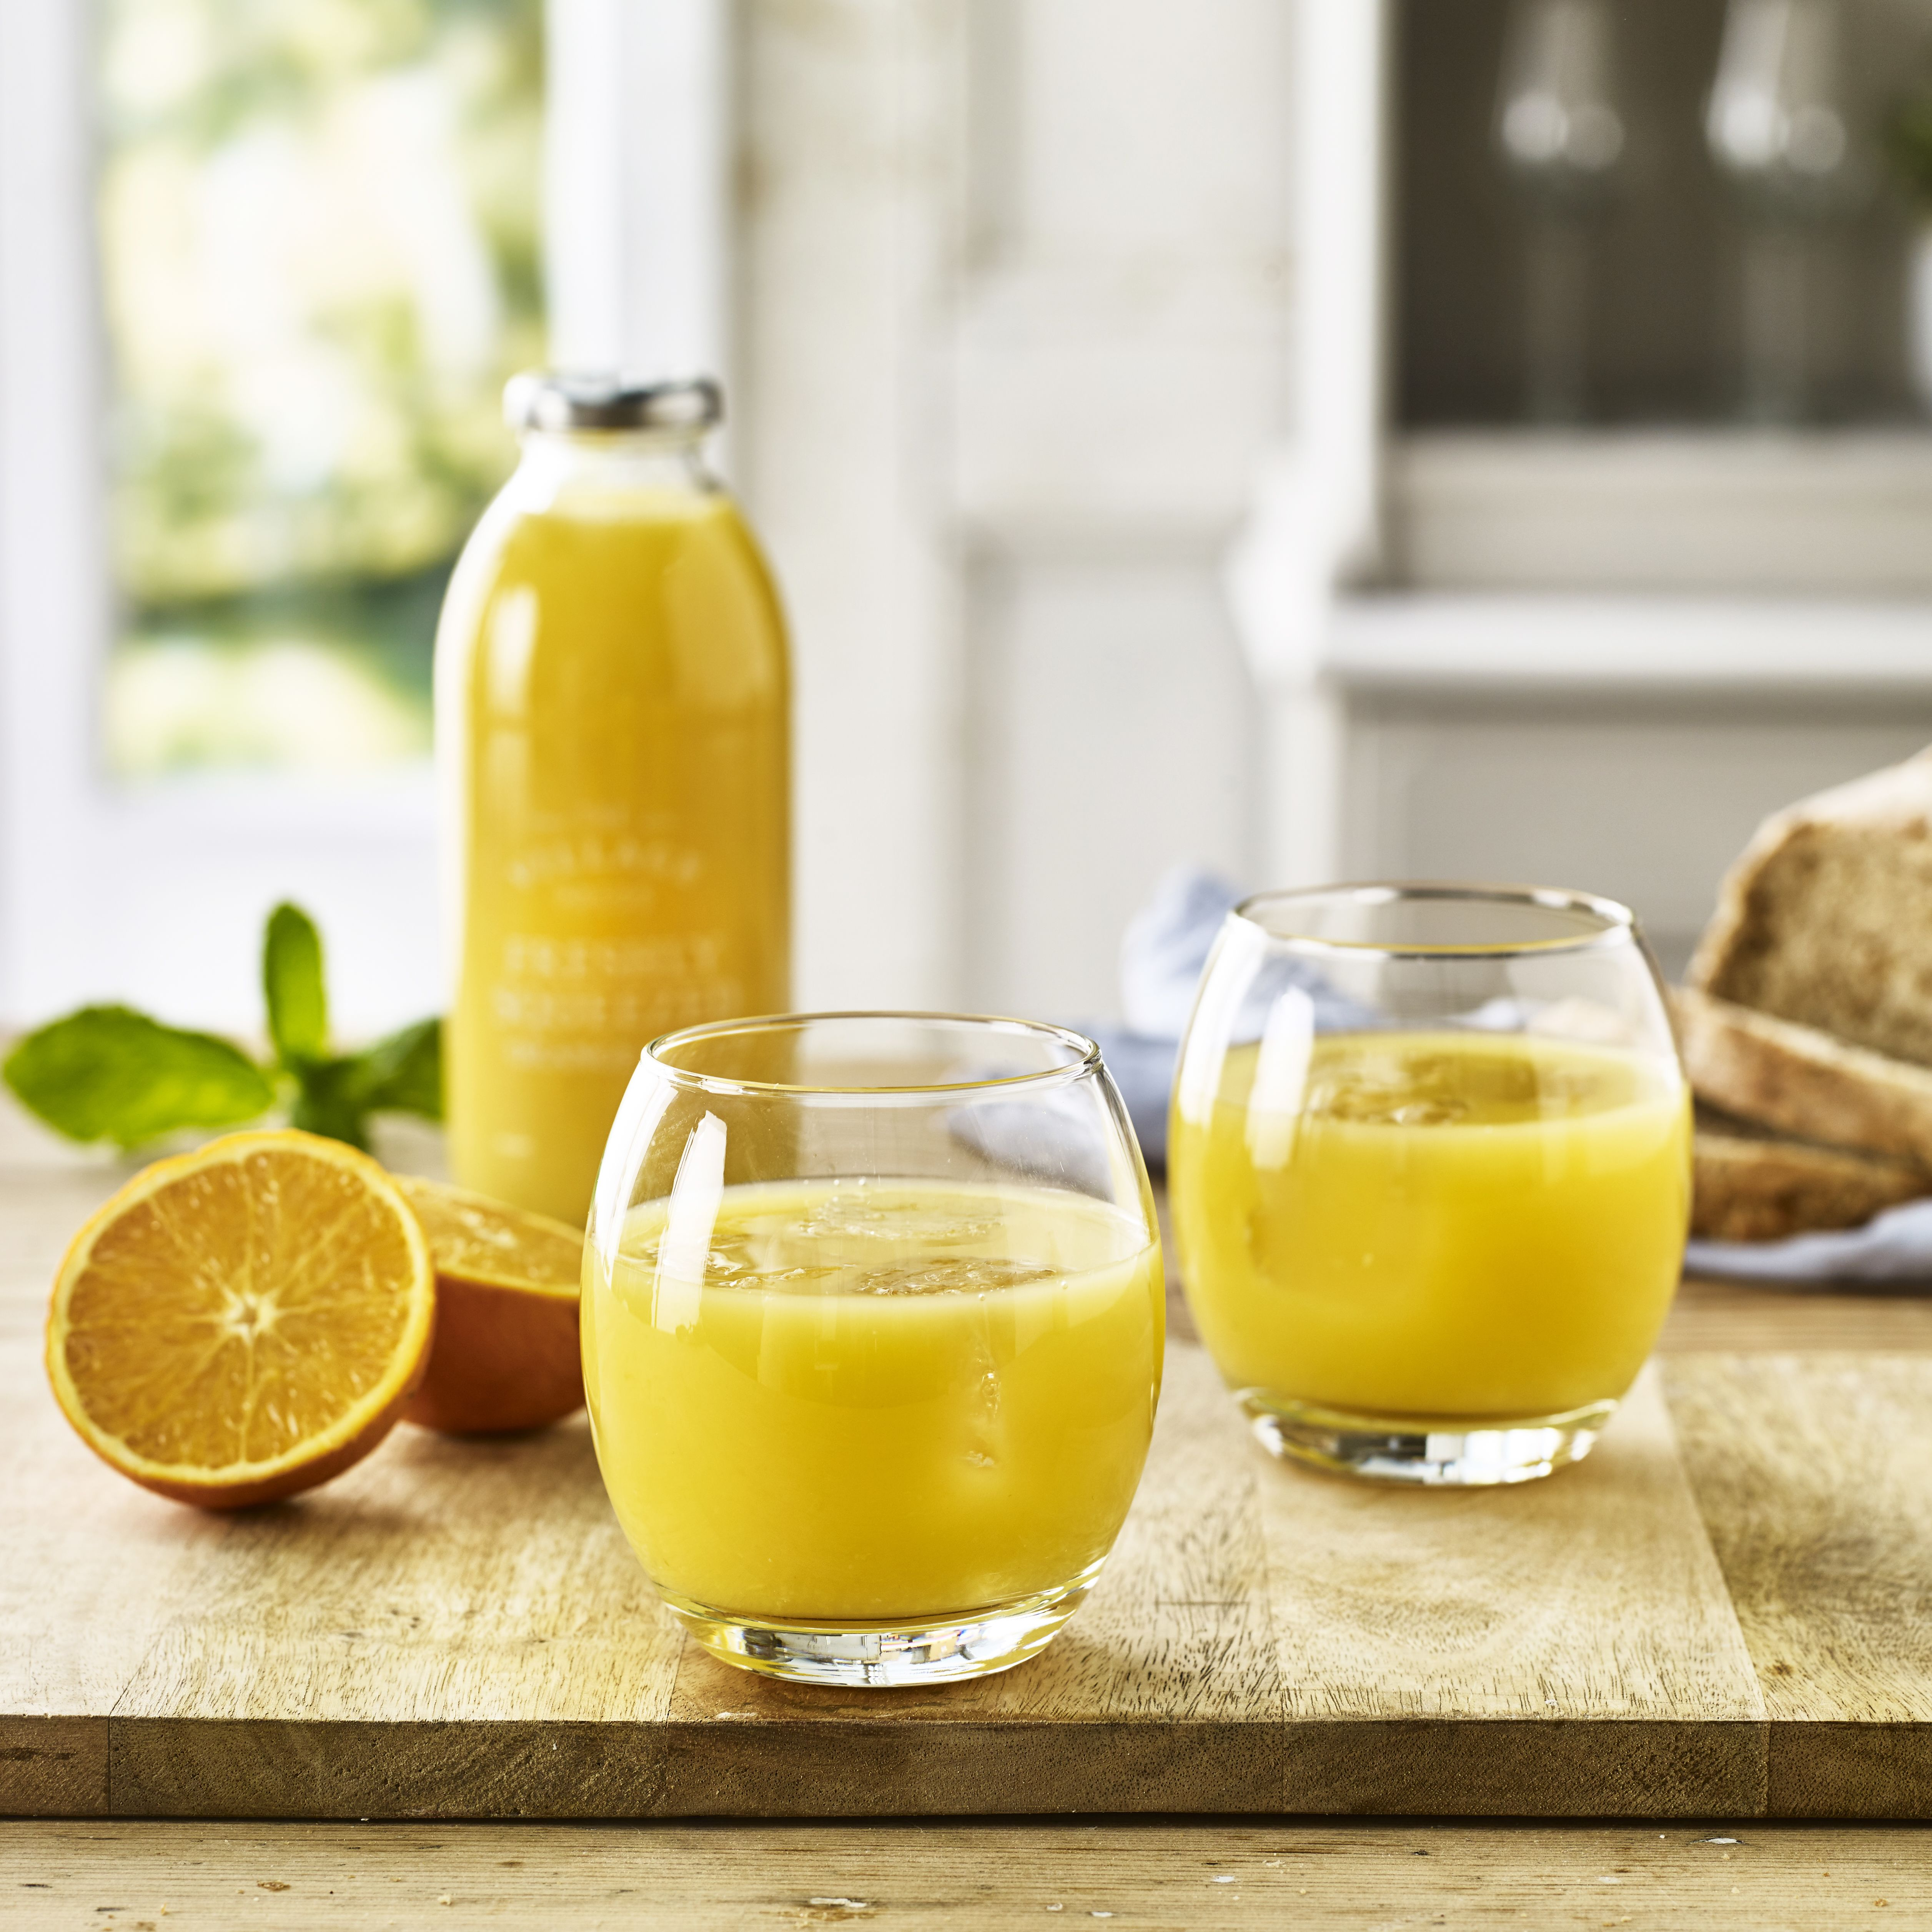 The Village Press Freshly Squeezed Orange Juice, 500ml